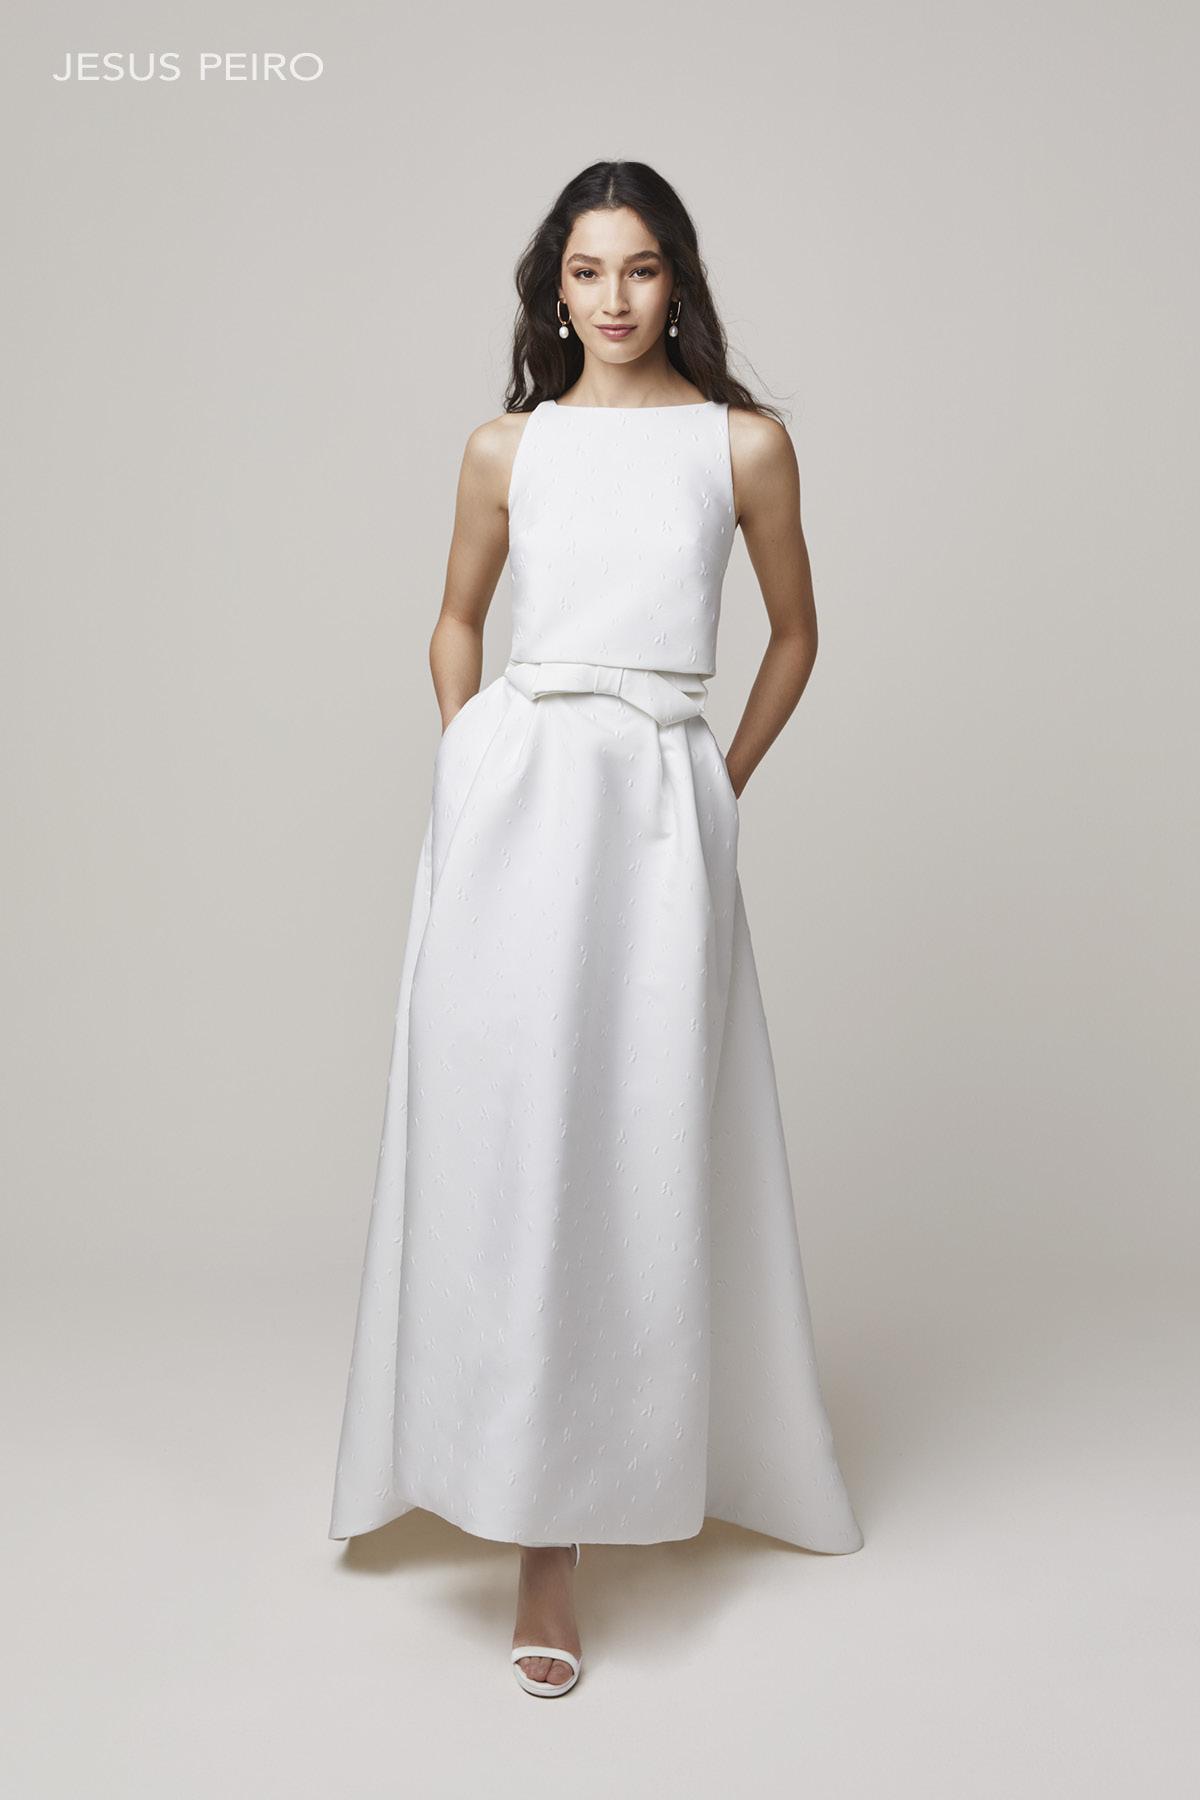 Vestido novia Jesús Peiró Ref.2205